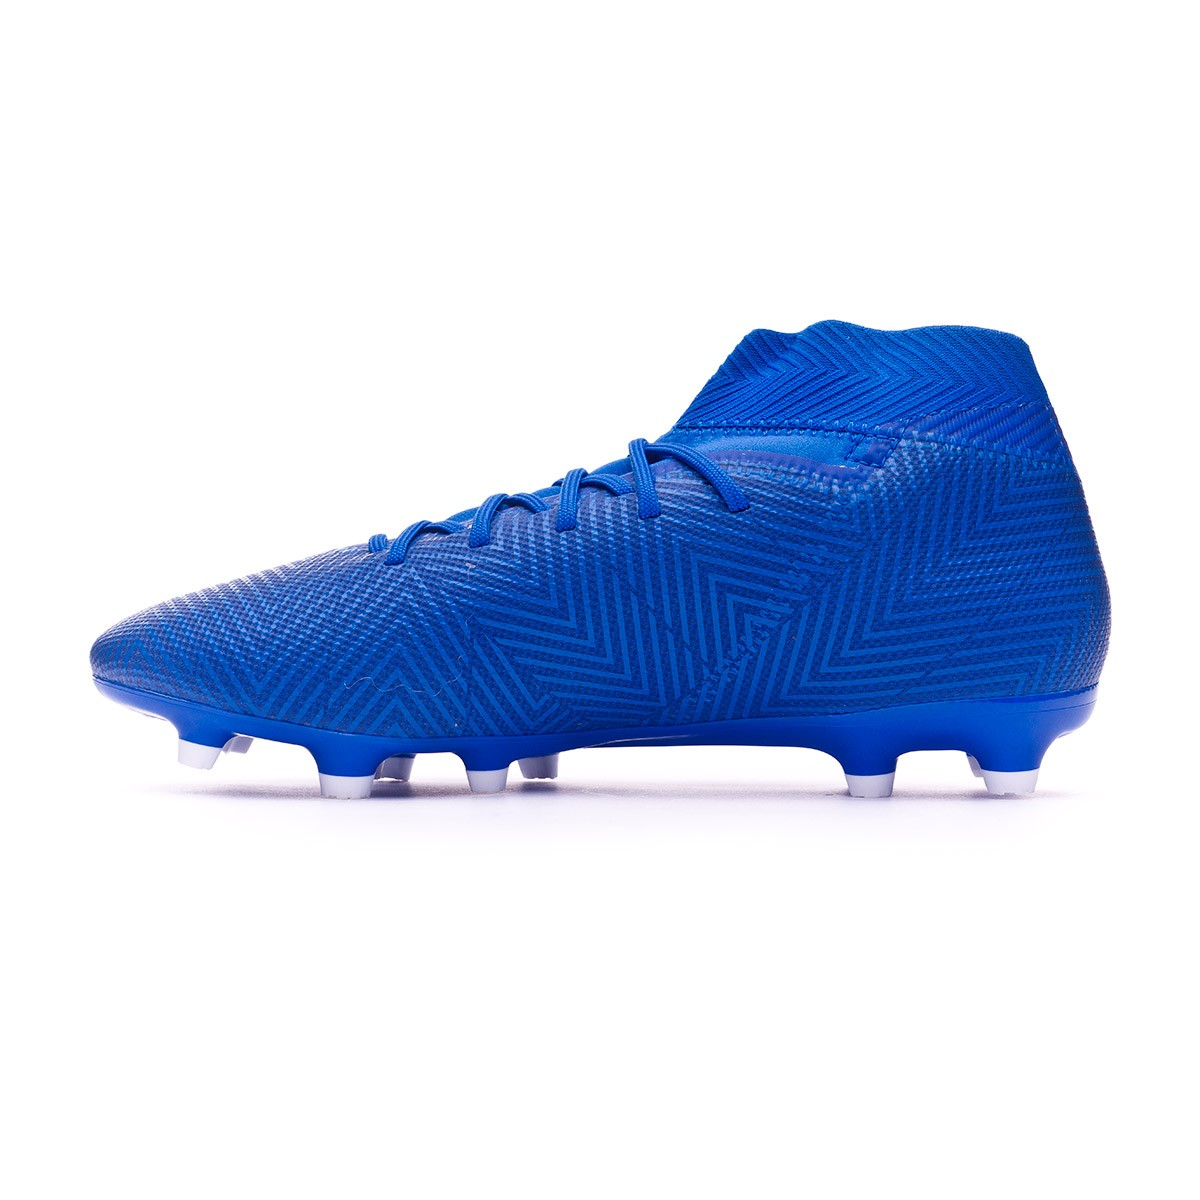 Zapatos de fútbol adidas Nemeziz 18.3 FG Football blue-White-Football blue  - Soloporteros es ahora Fútbol Emotion 1d437afd33f98